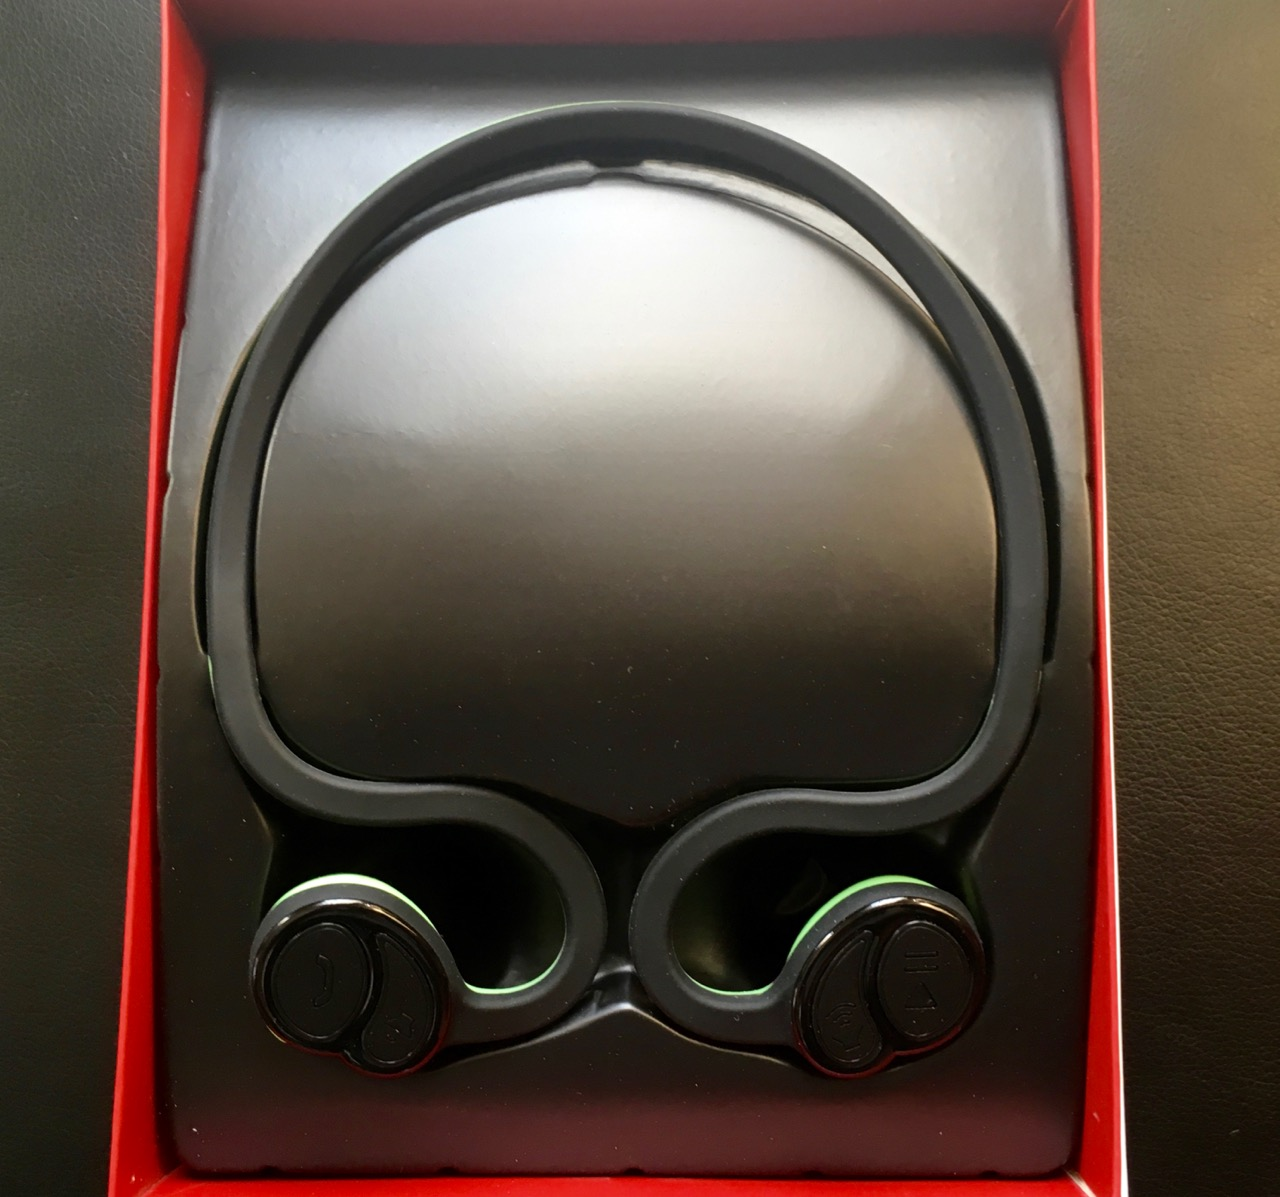 HV-600 Wireless Headphones